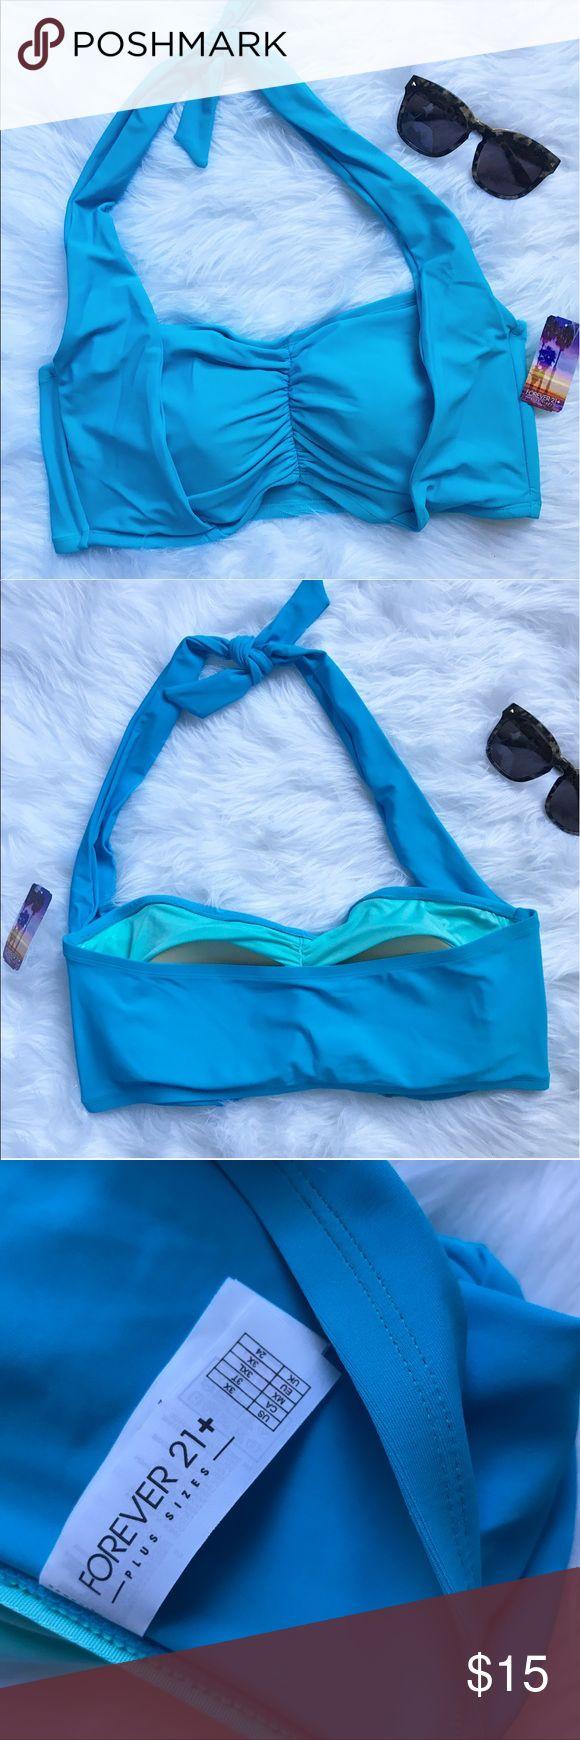 NEW 3x plus size bandeau halter bikini top NEW with tags 3x plus size bandeau halter bikini top . Blue Forever 21 Swim Bikinis